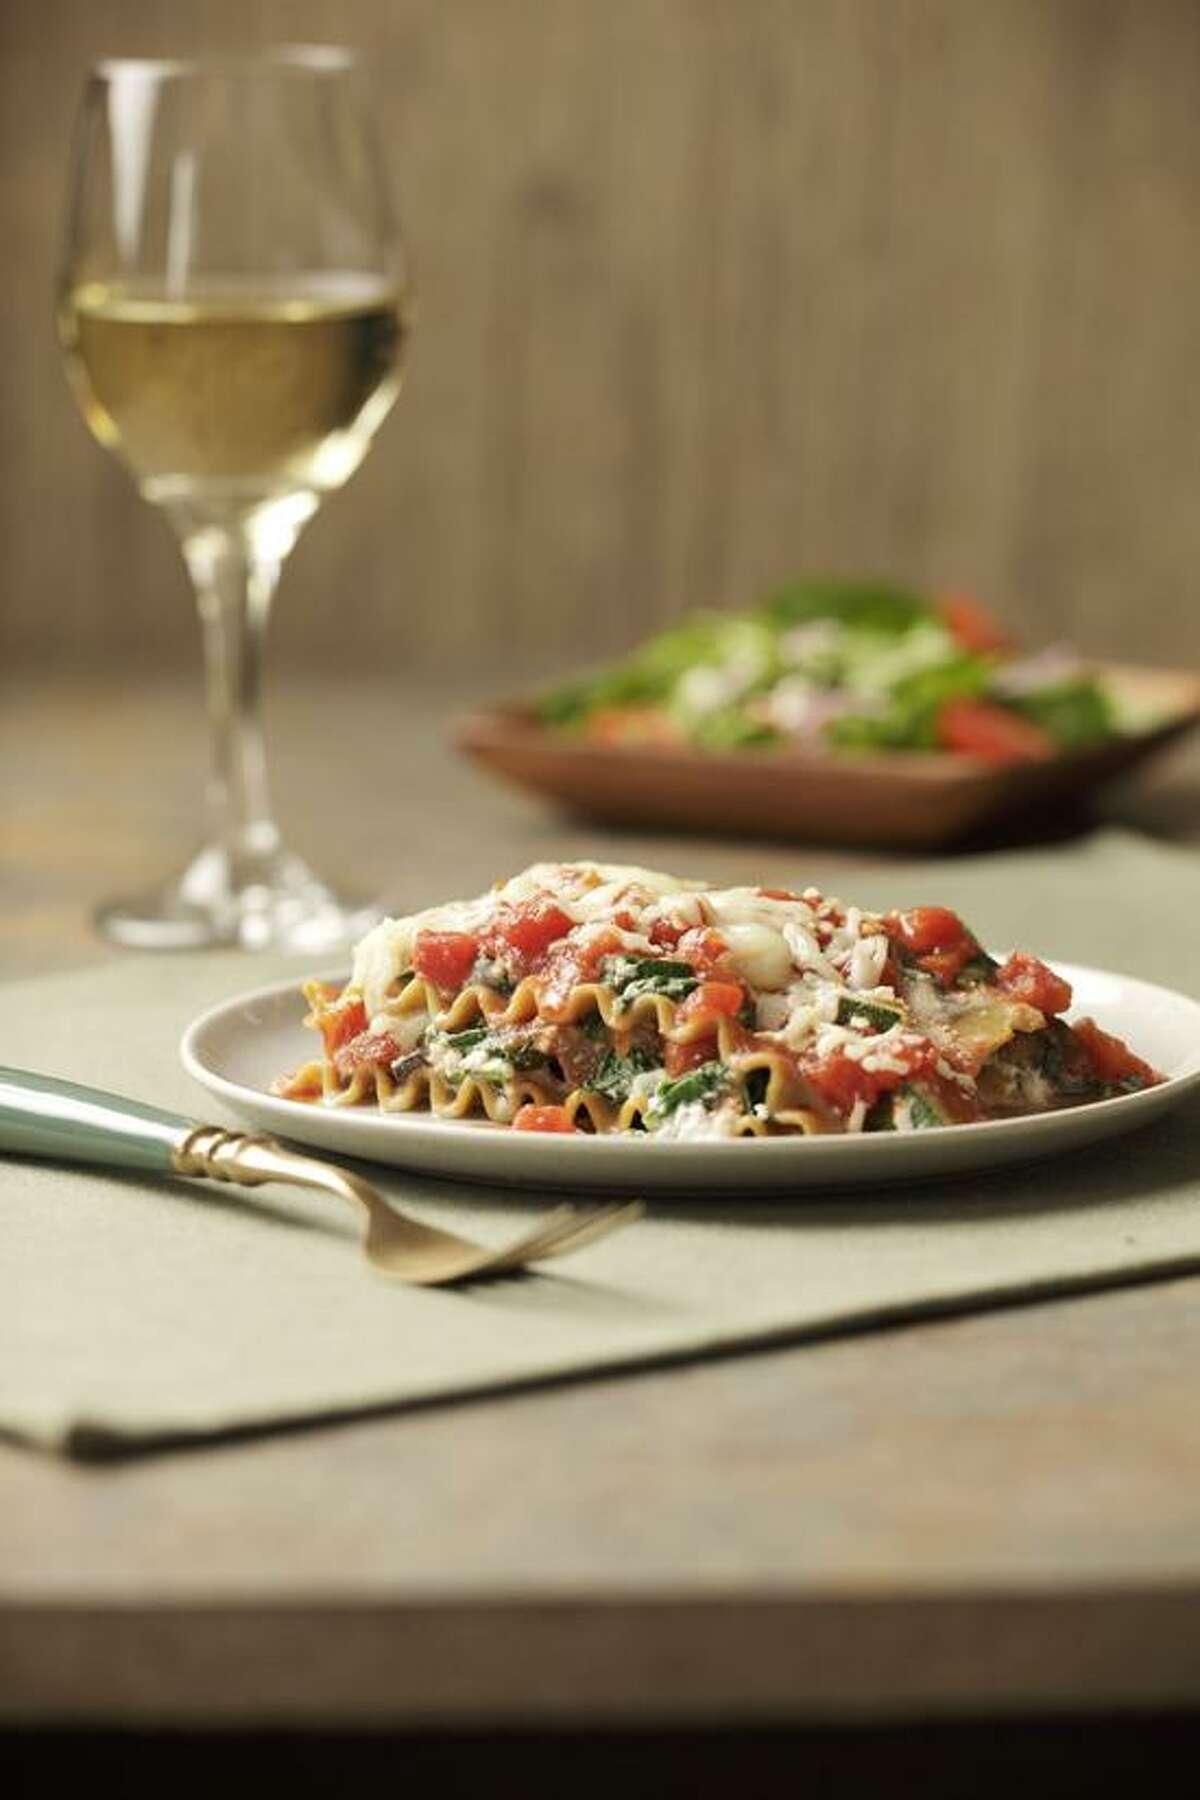 Ken Burris/EatingWell photo: Slow Cooker Vegetarian Lasagna